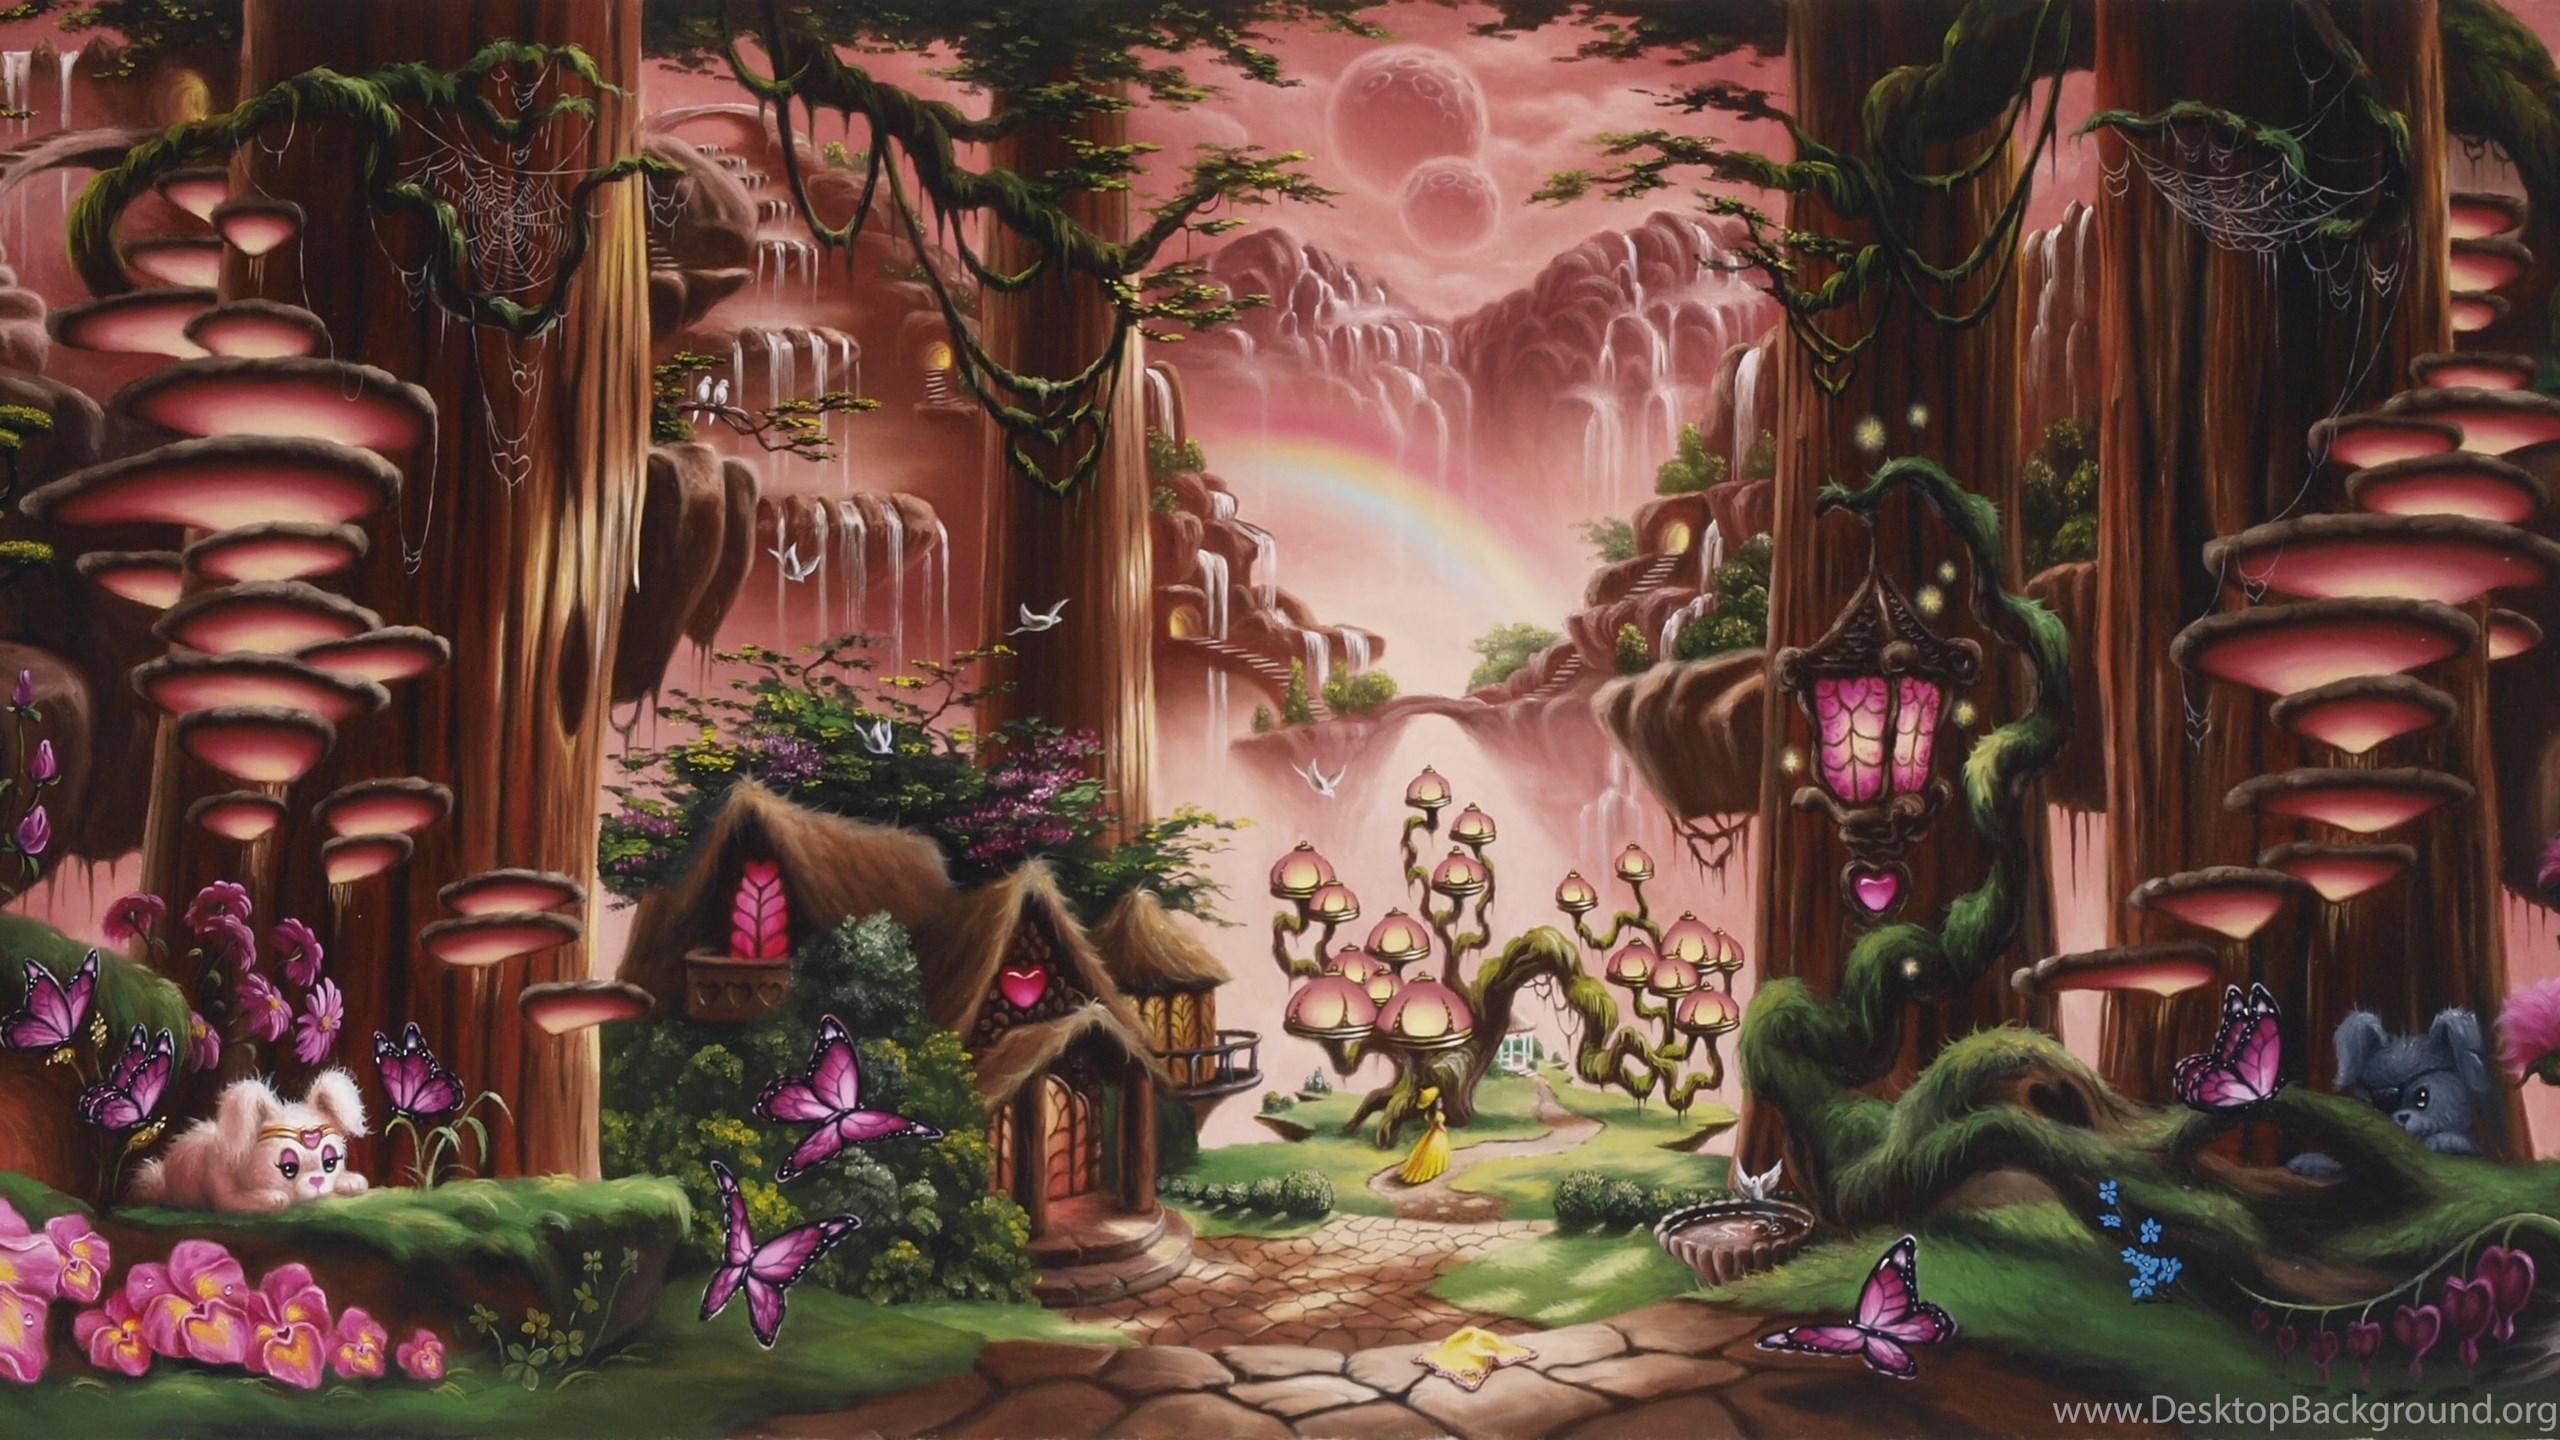 Wallpapers Fairytale Fantasy 3316x1656 Desktop Background